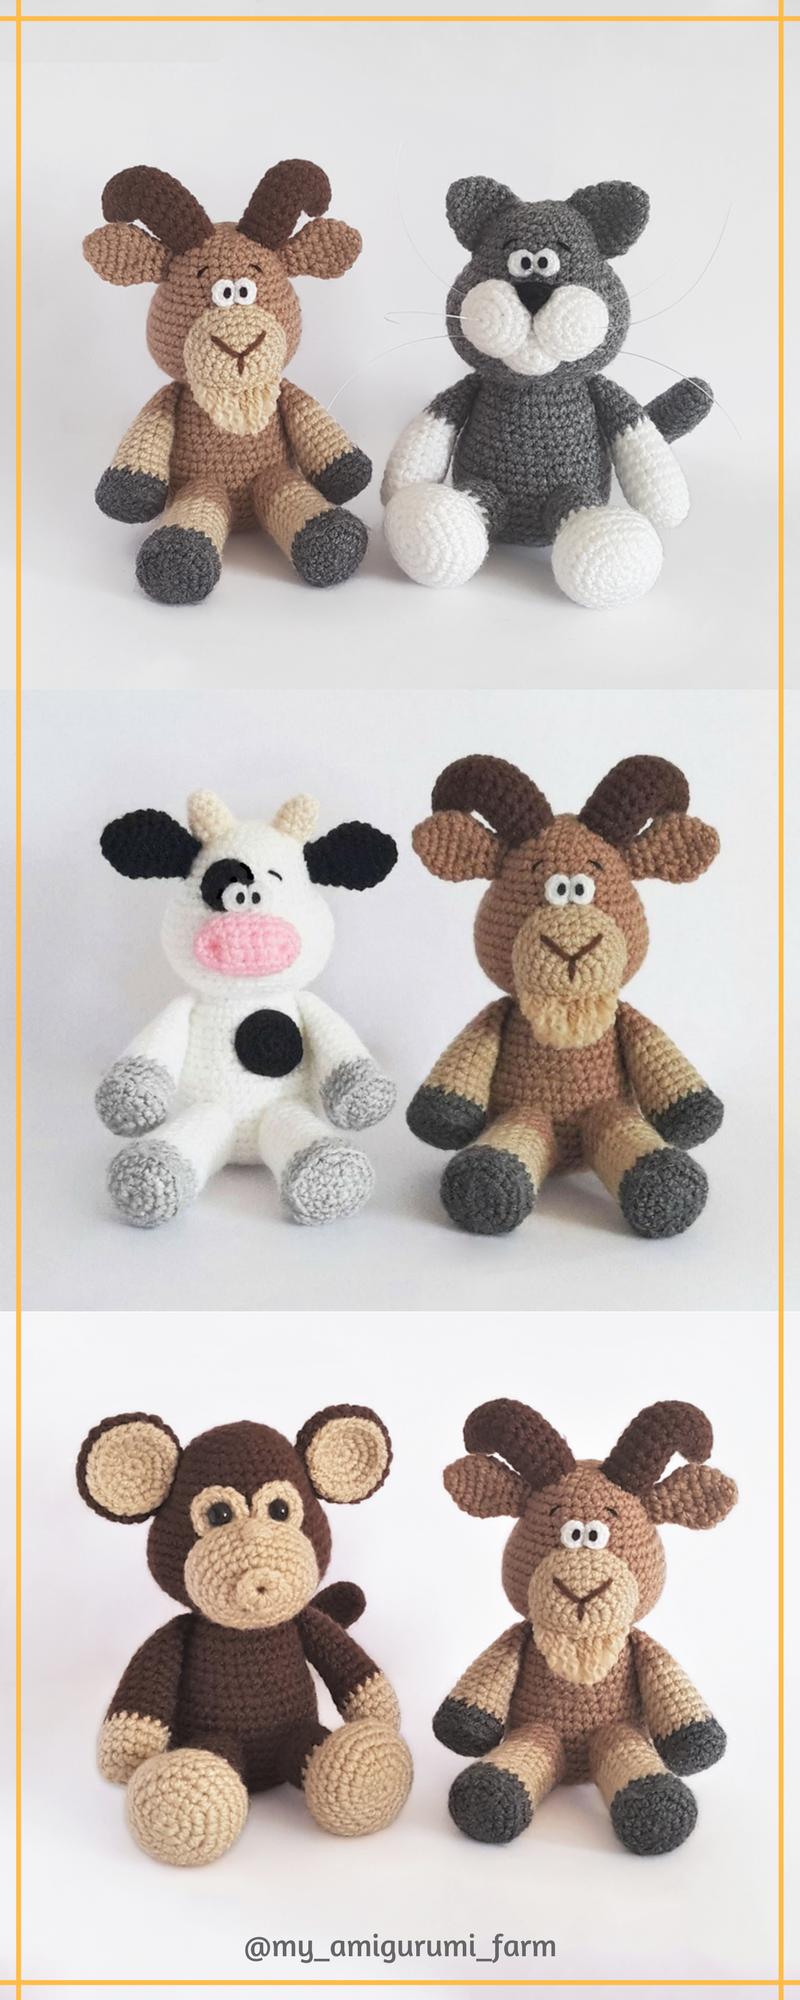 Cute crochet animals, amigurumi patterns   2018   Pinterest